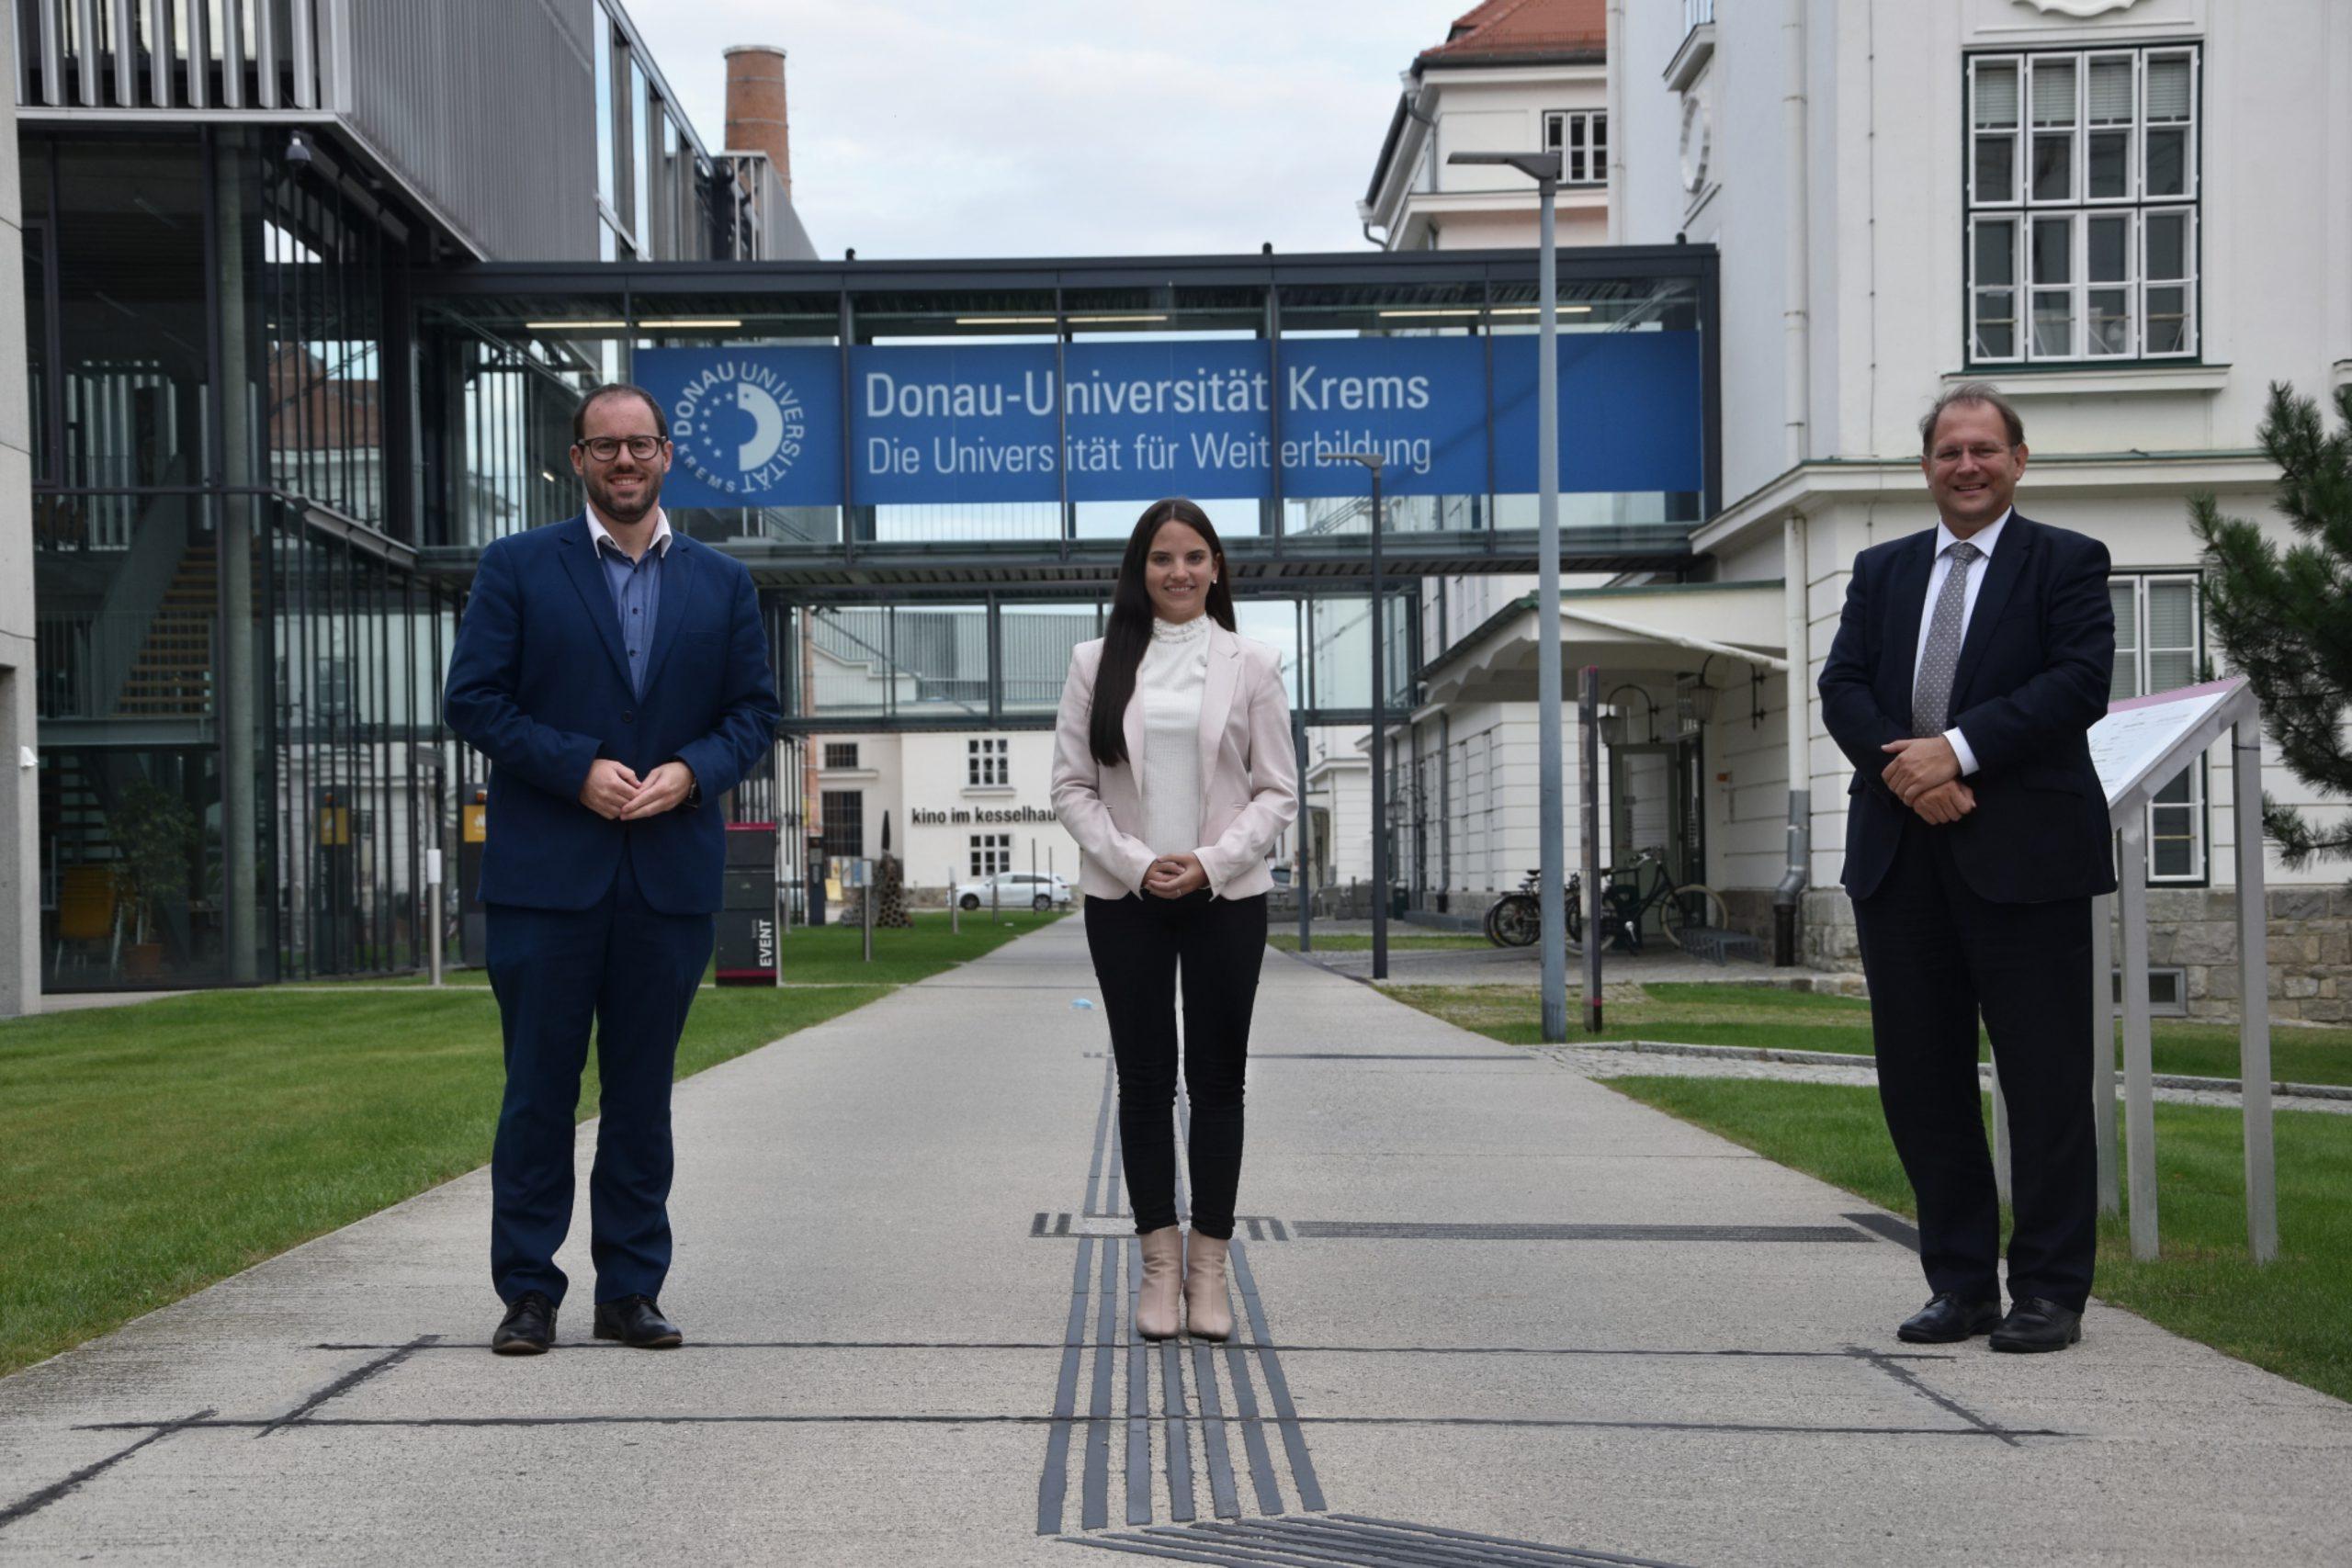 Kooperation mit Donau-Universität fortgesetzt 1